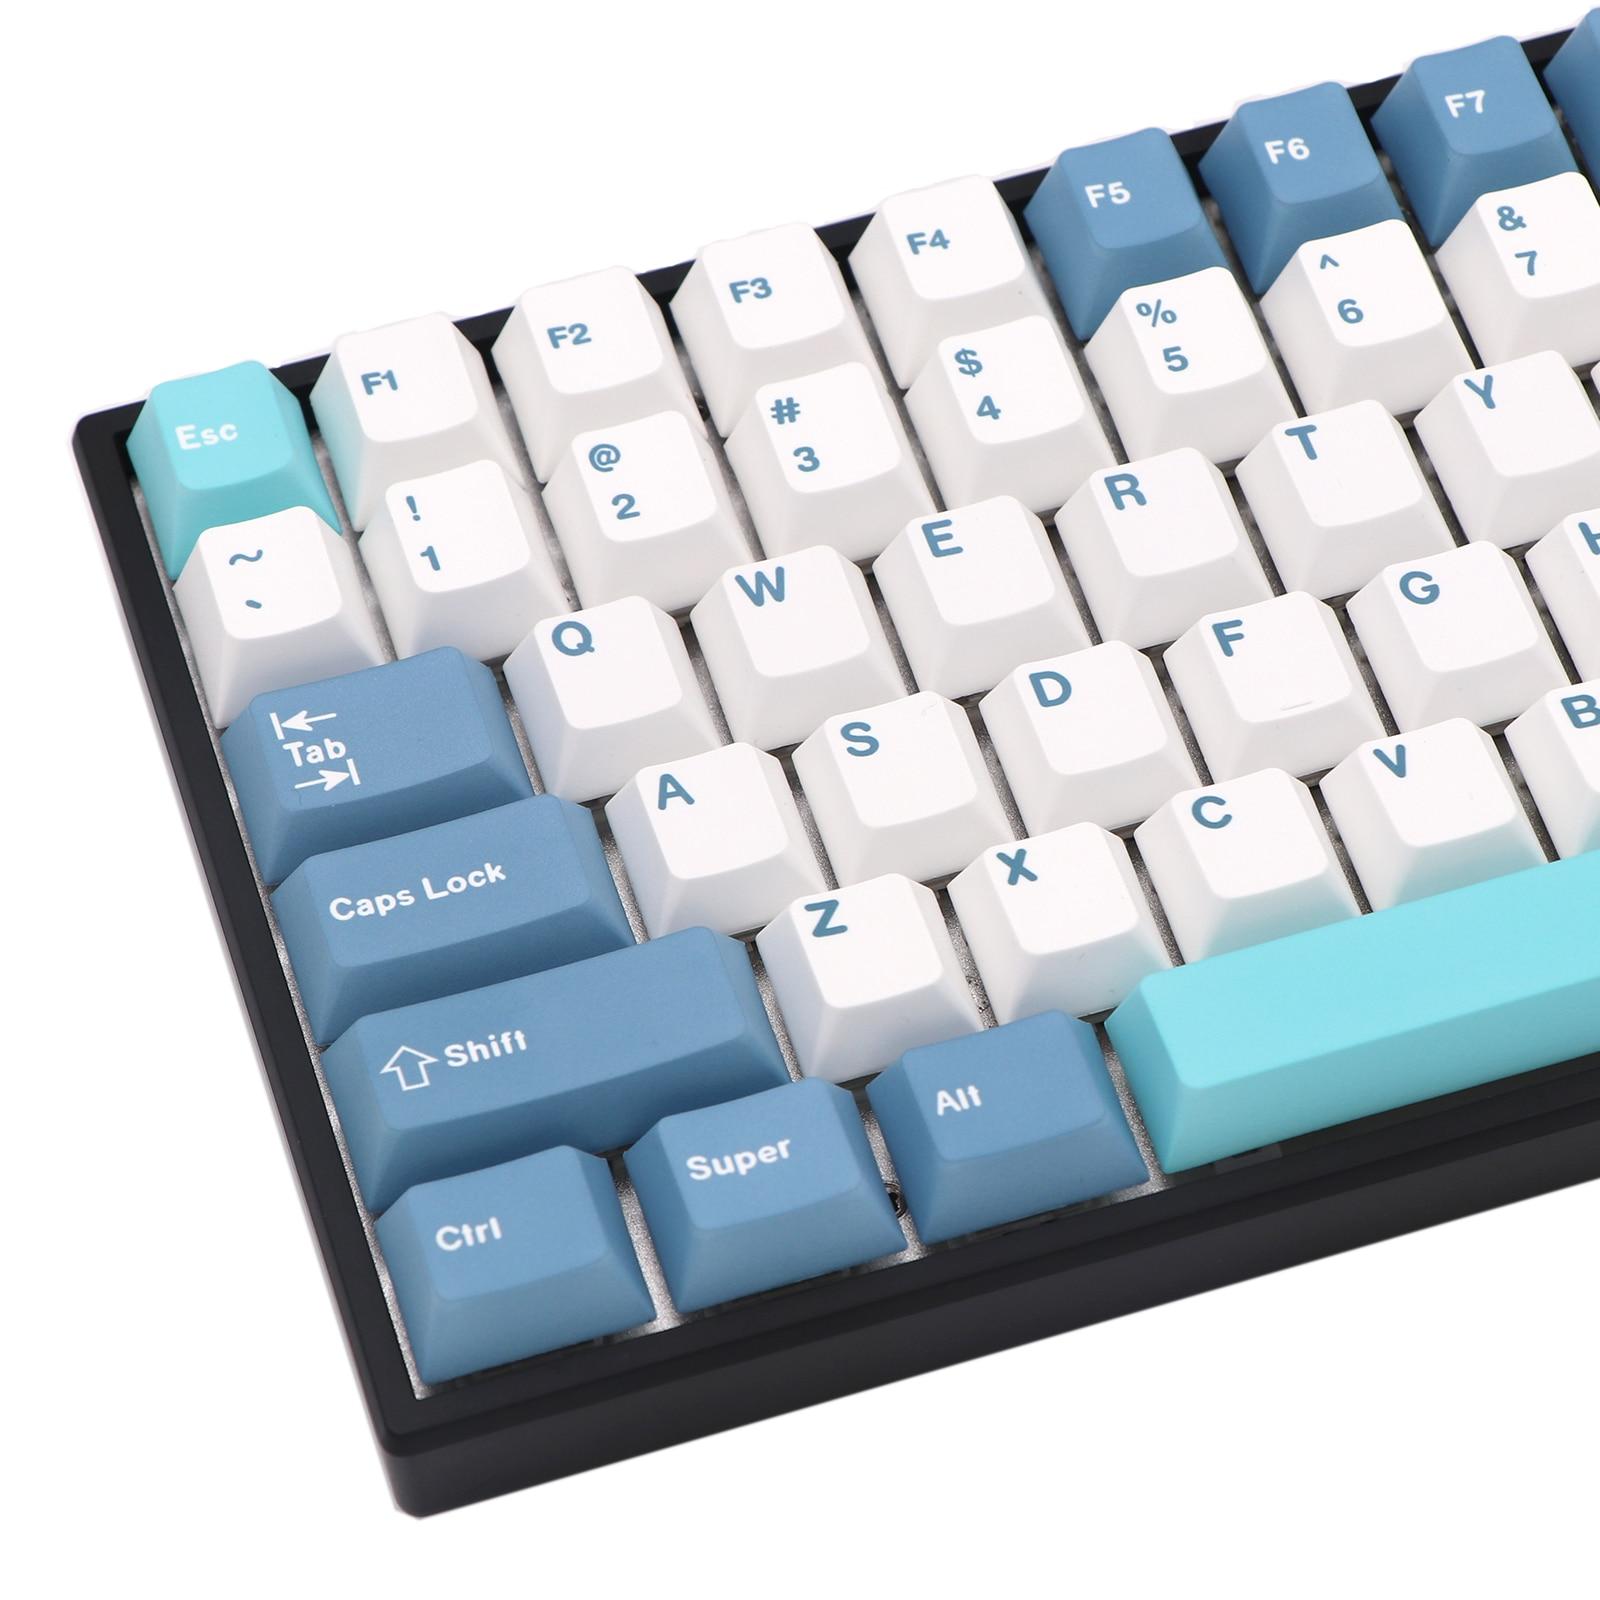 Keypro Whistle Keycaps 136Keys&149keys Dye Subbed Cherry Profile Keycaps For Wired USB mechanical keyboard Cherry MX switch